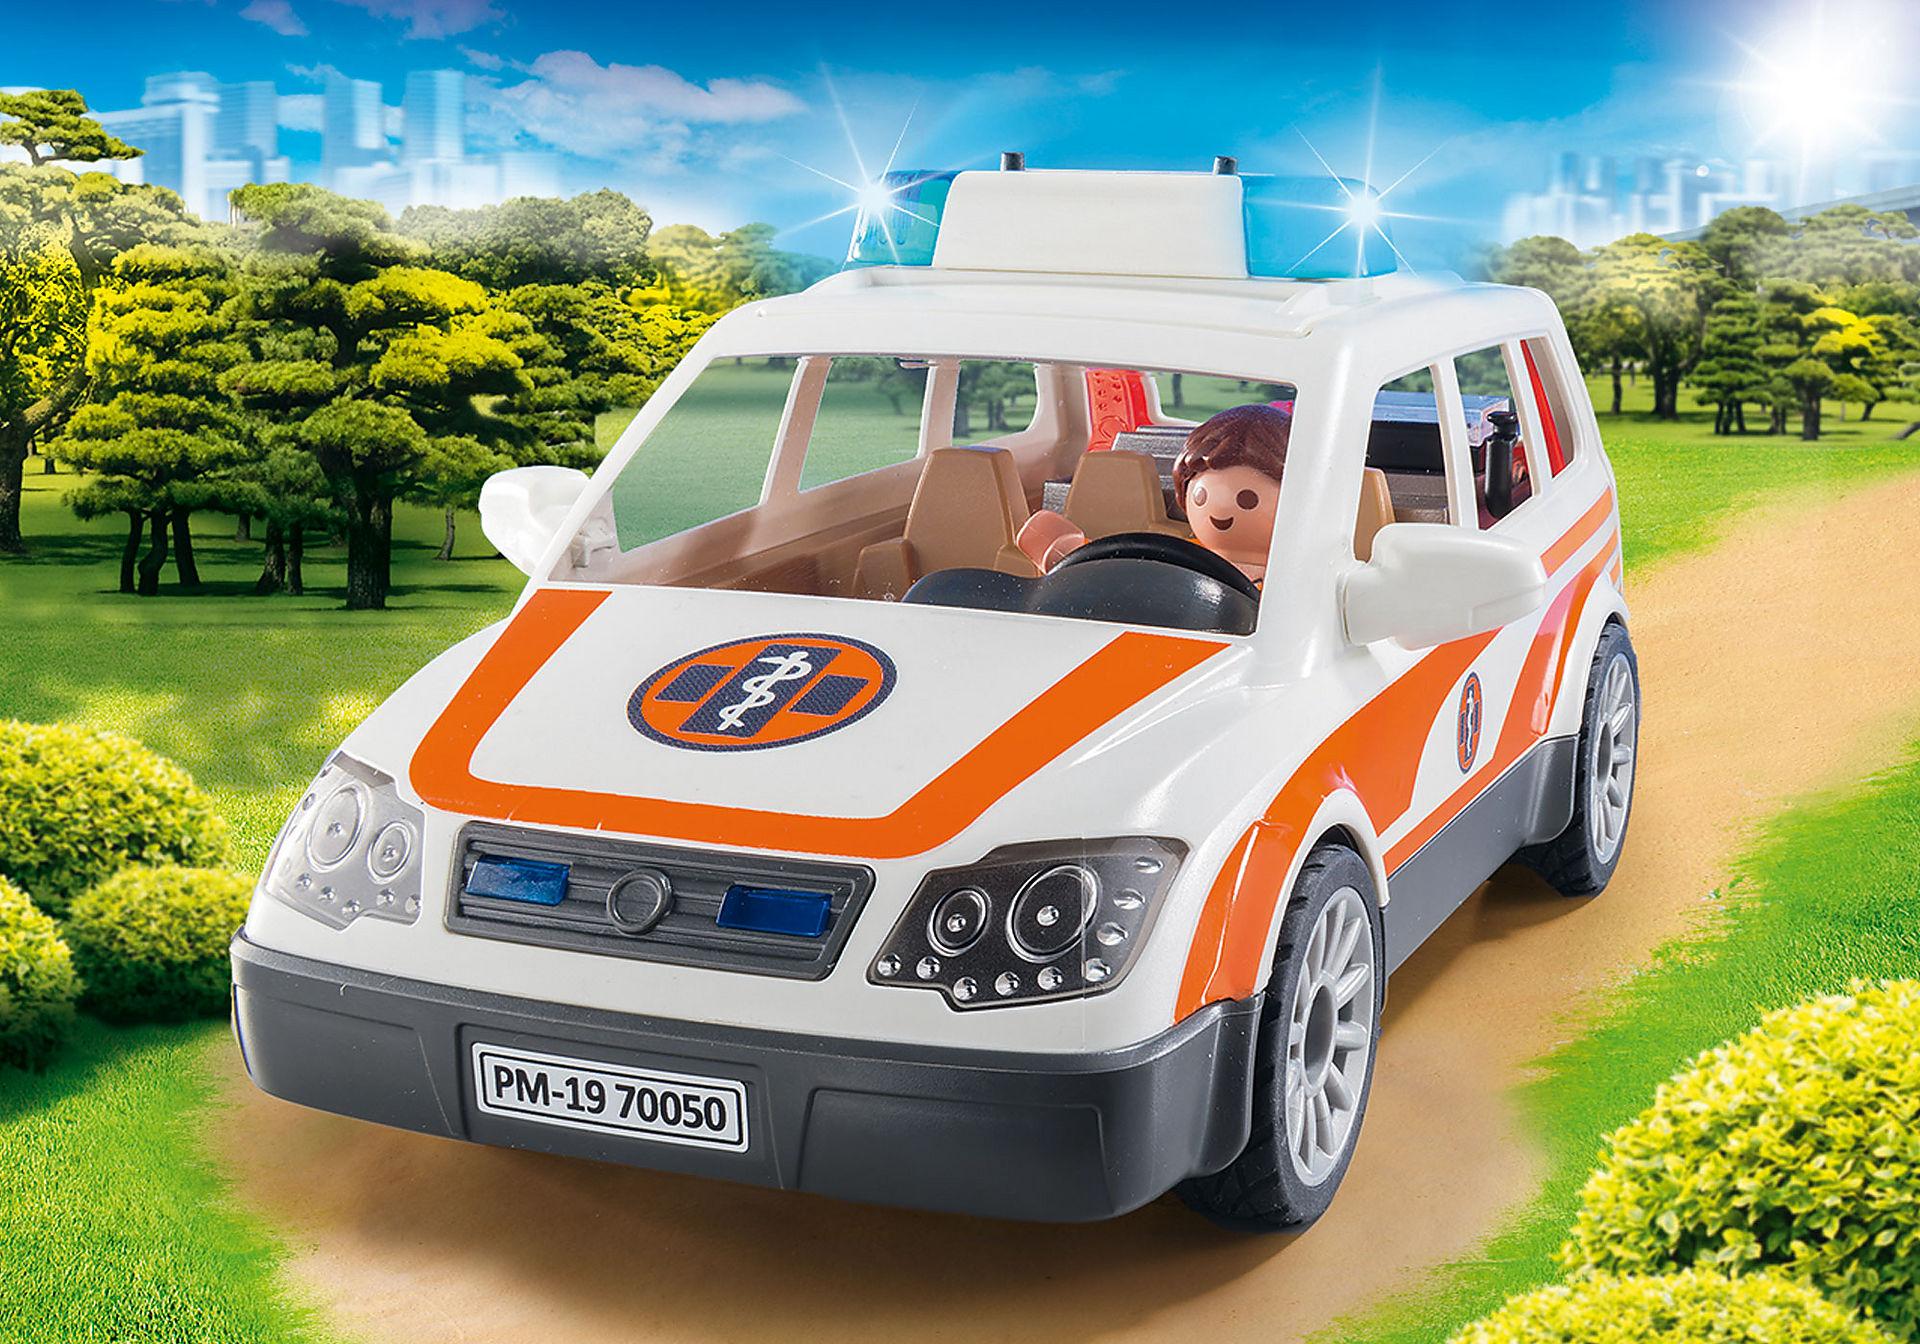 http://media.playmobil.com/i/playmobil/70050_product_extra3/Voiture et ambulanciers